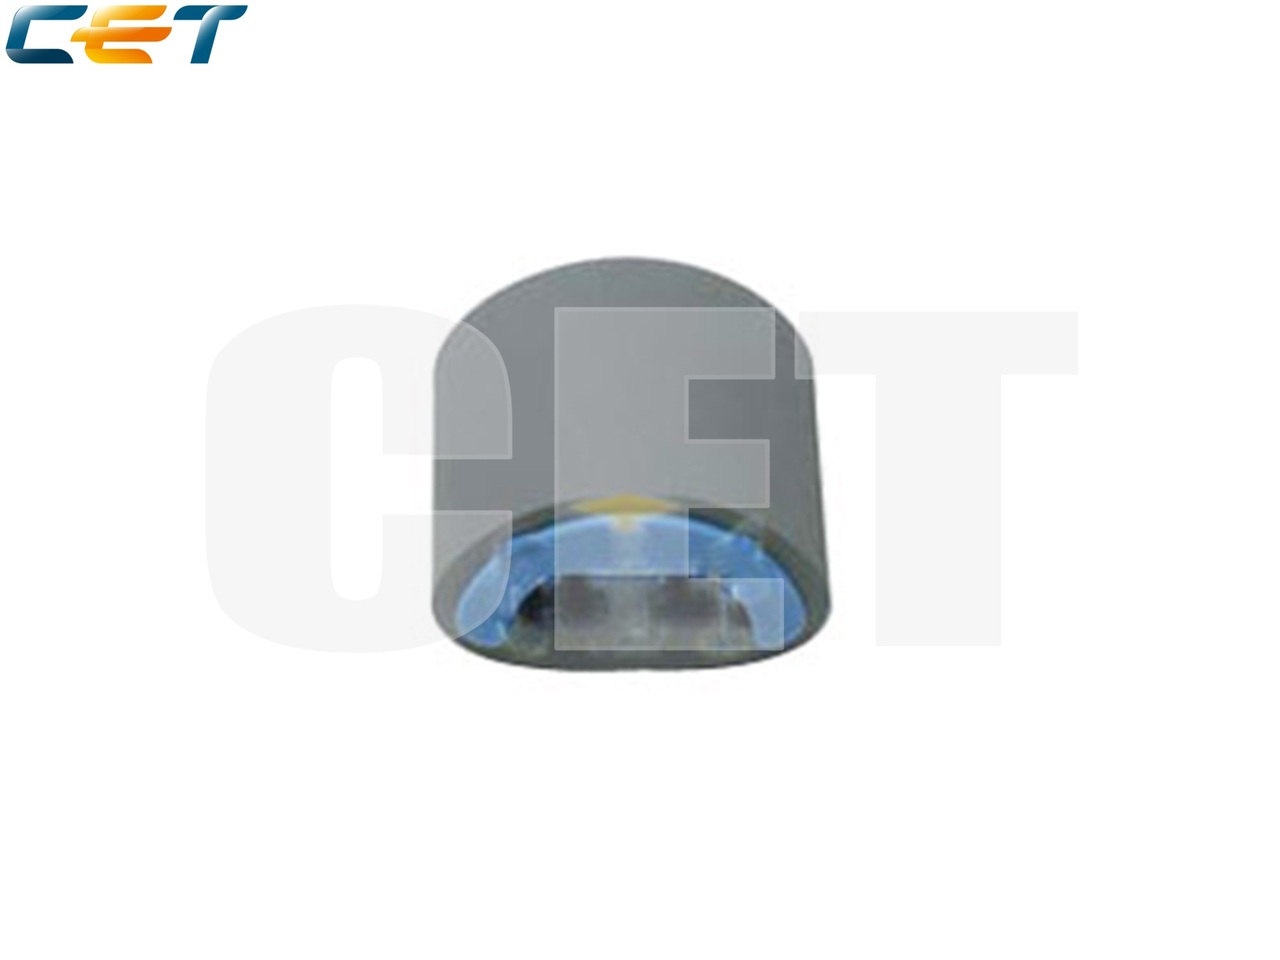 Ролик подхвата RC1-2050-000 для HP LaserJet1010/1015/1020/1022 (CET), CET1132, CET1132R